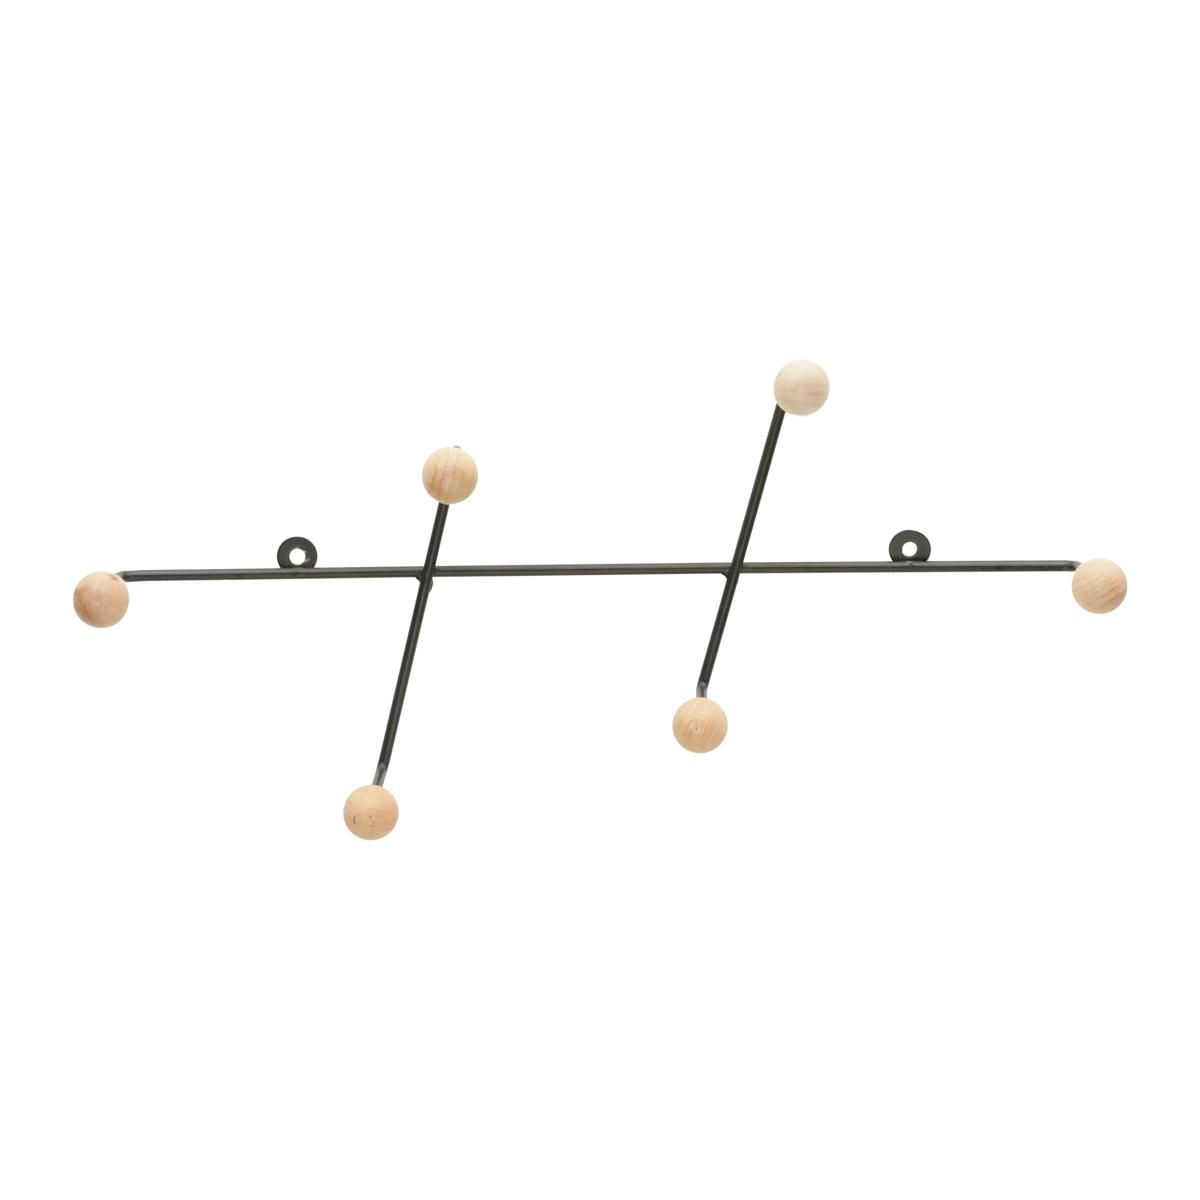 Cabideiro Metal Vertical Slant Preto 15 x 6 x 32 cm